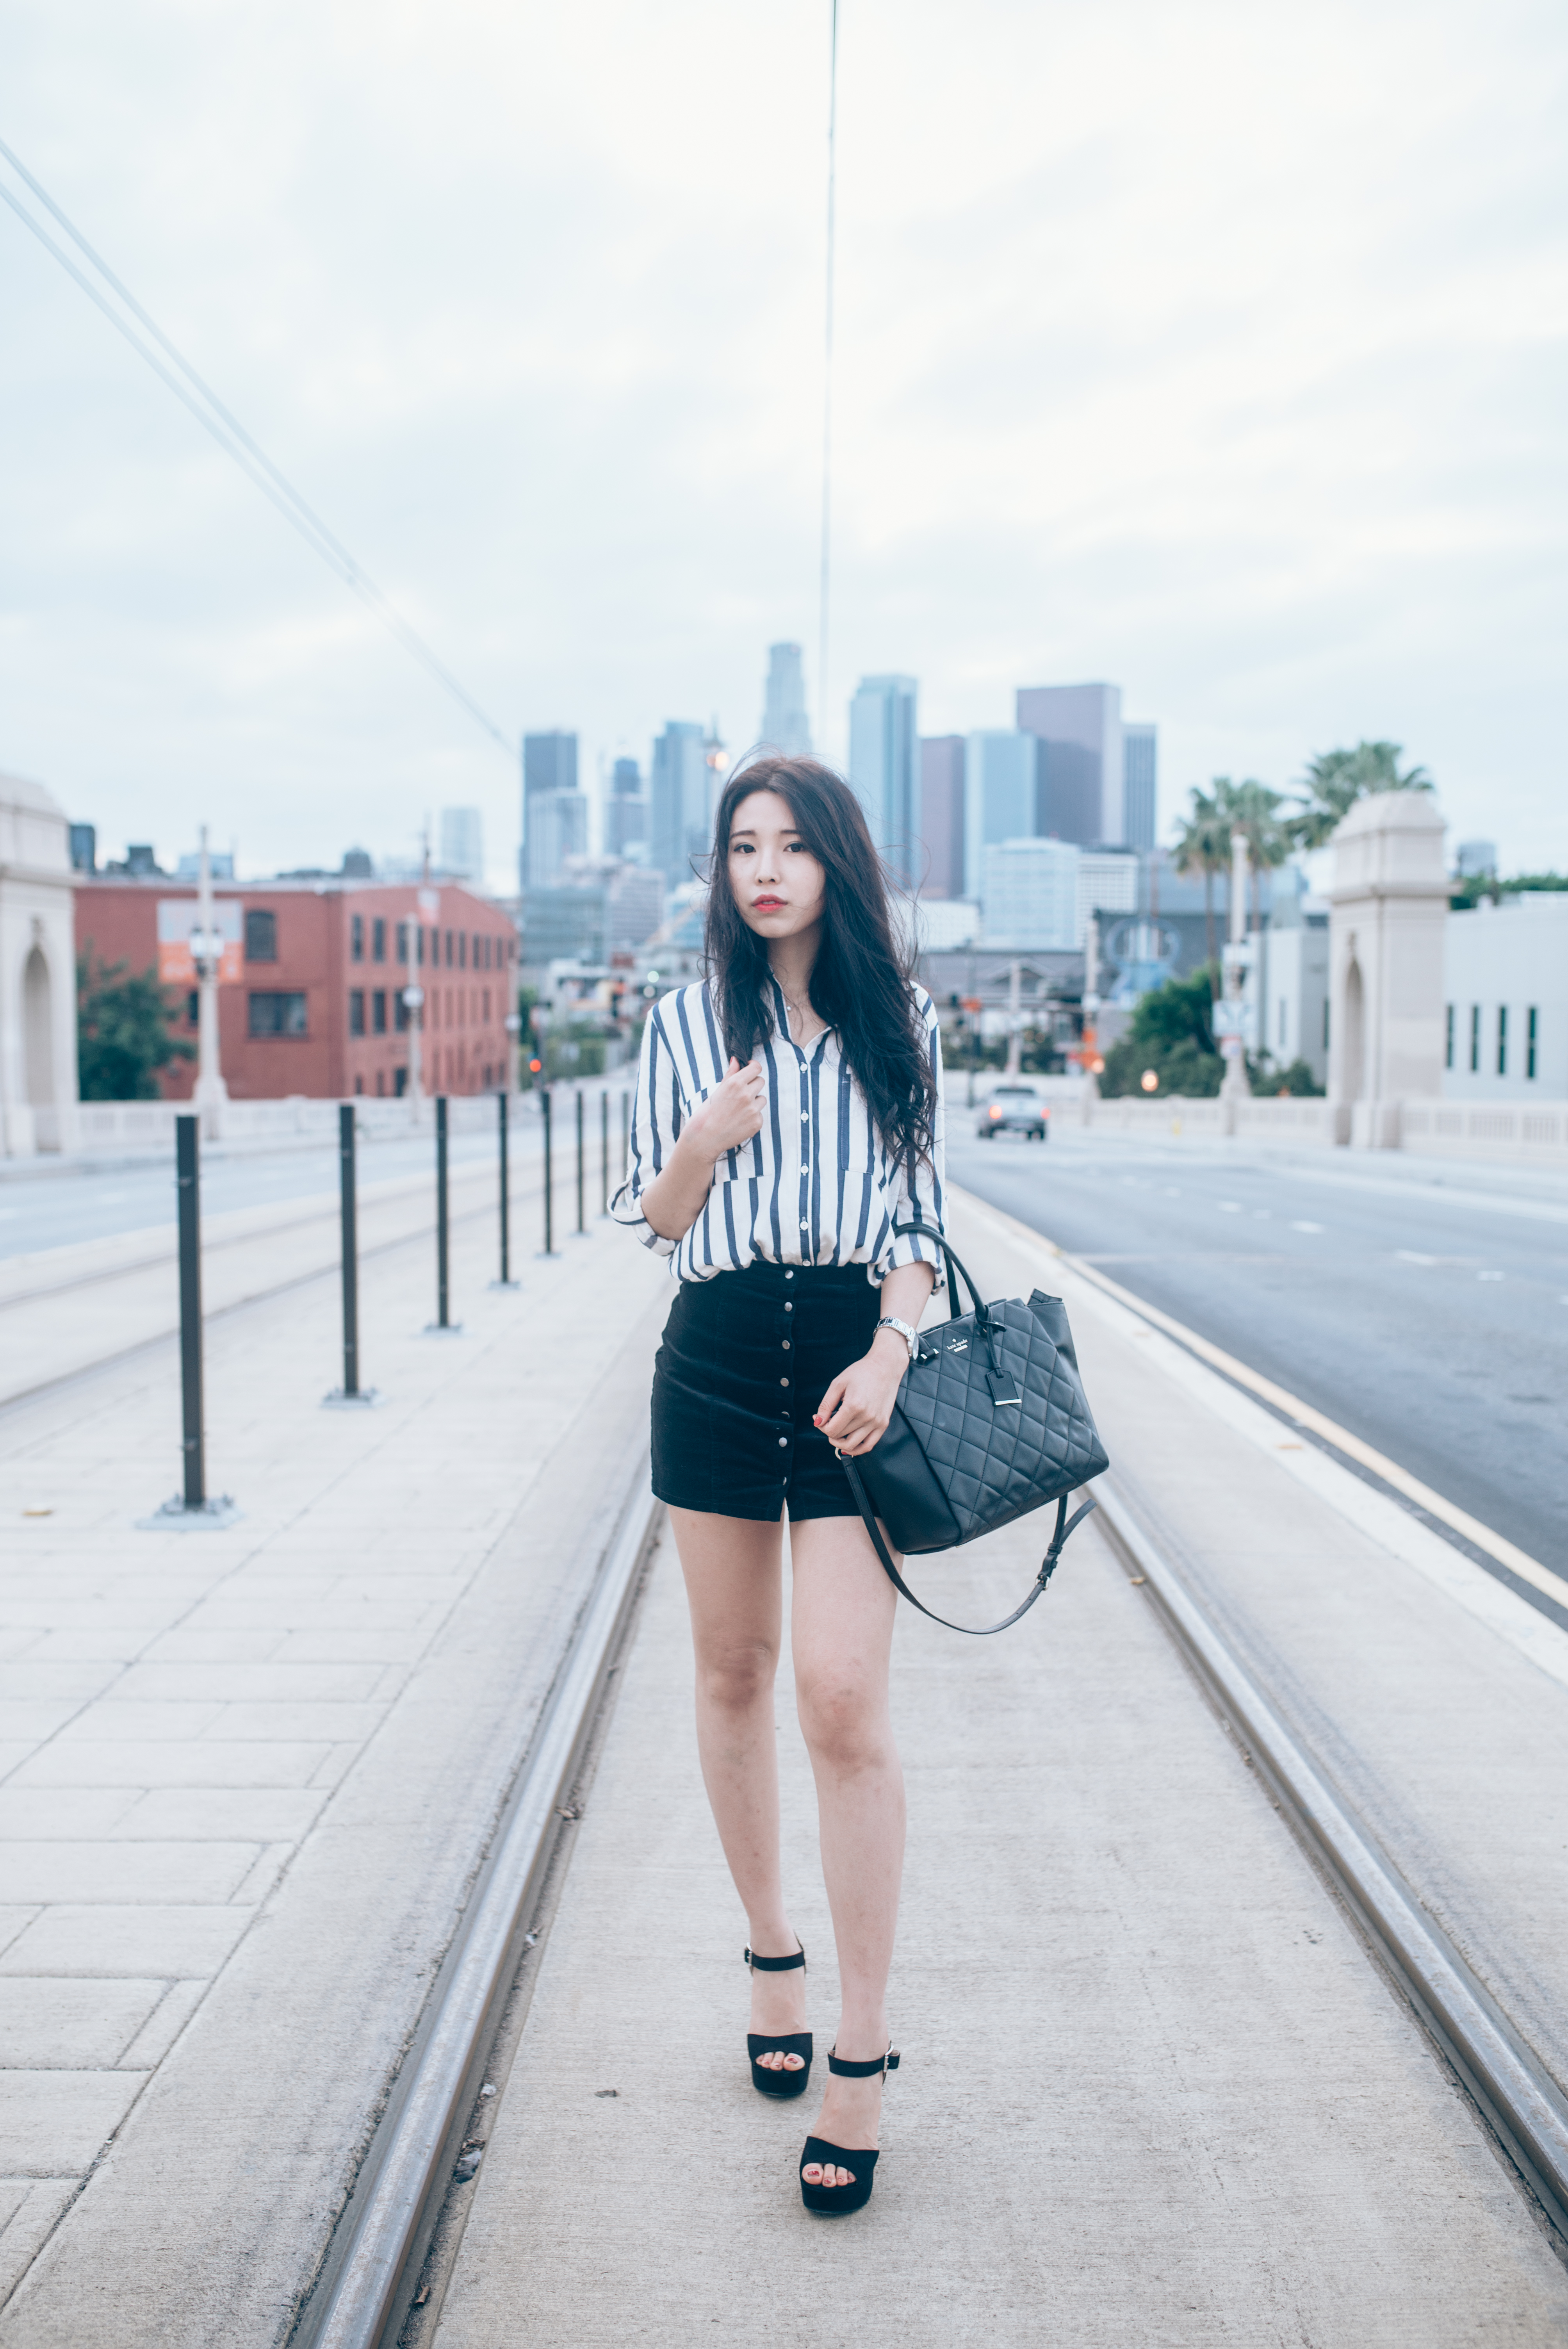 Korean dating los angeles